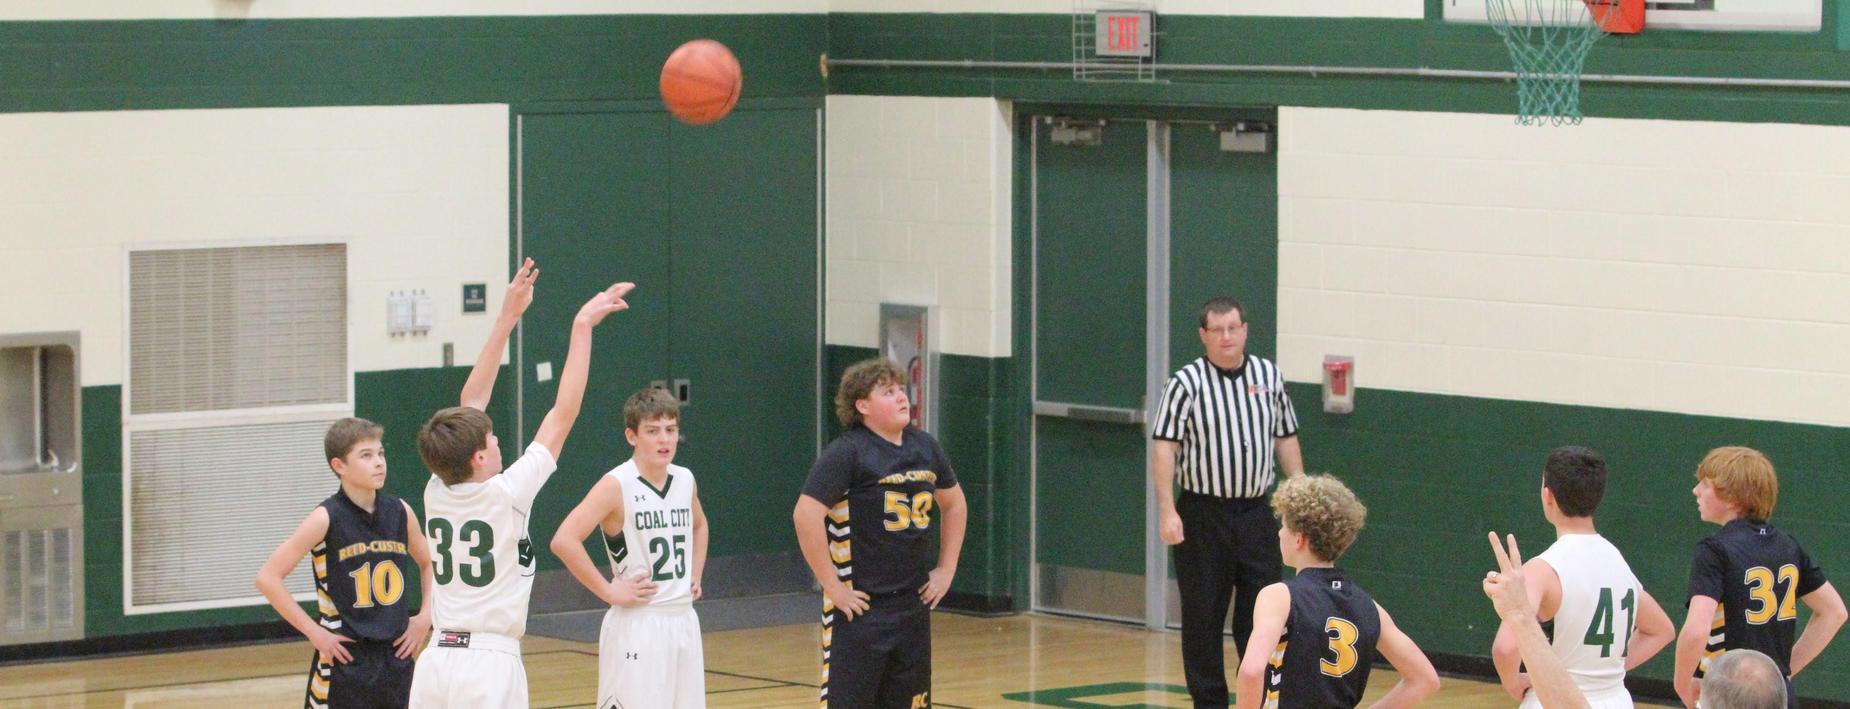 Free throw Boys Basketball